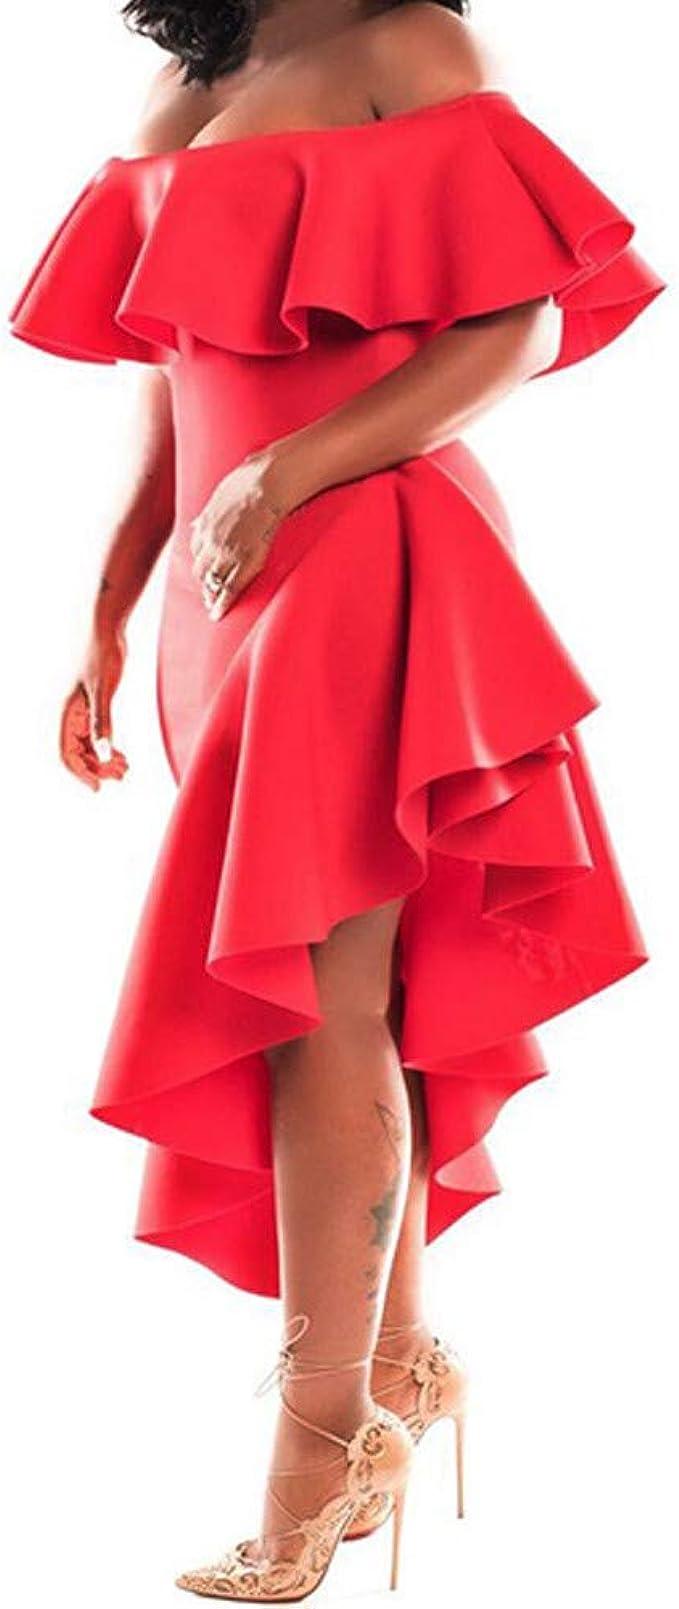 Sylar Vestidos Para Mujer Fiesta, Moda Cuello Halter Rojo Ruffle ...